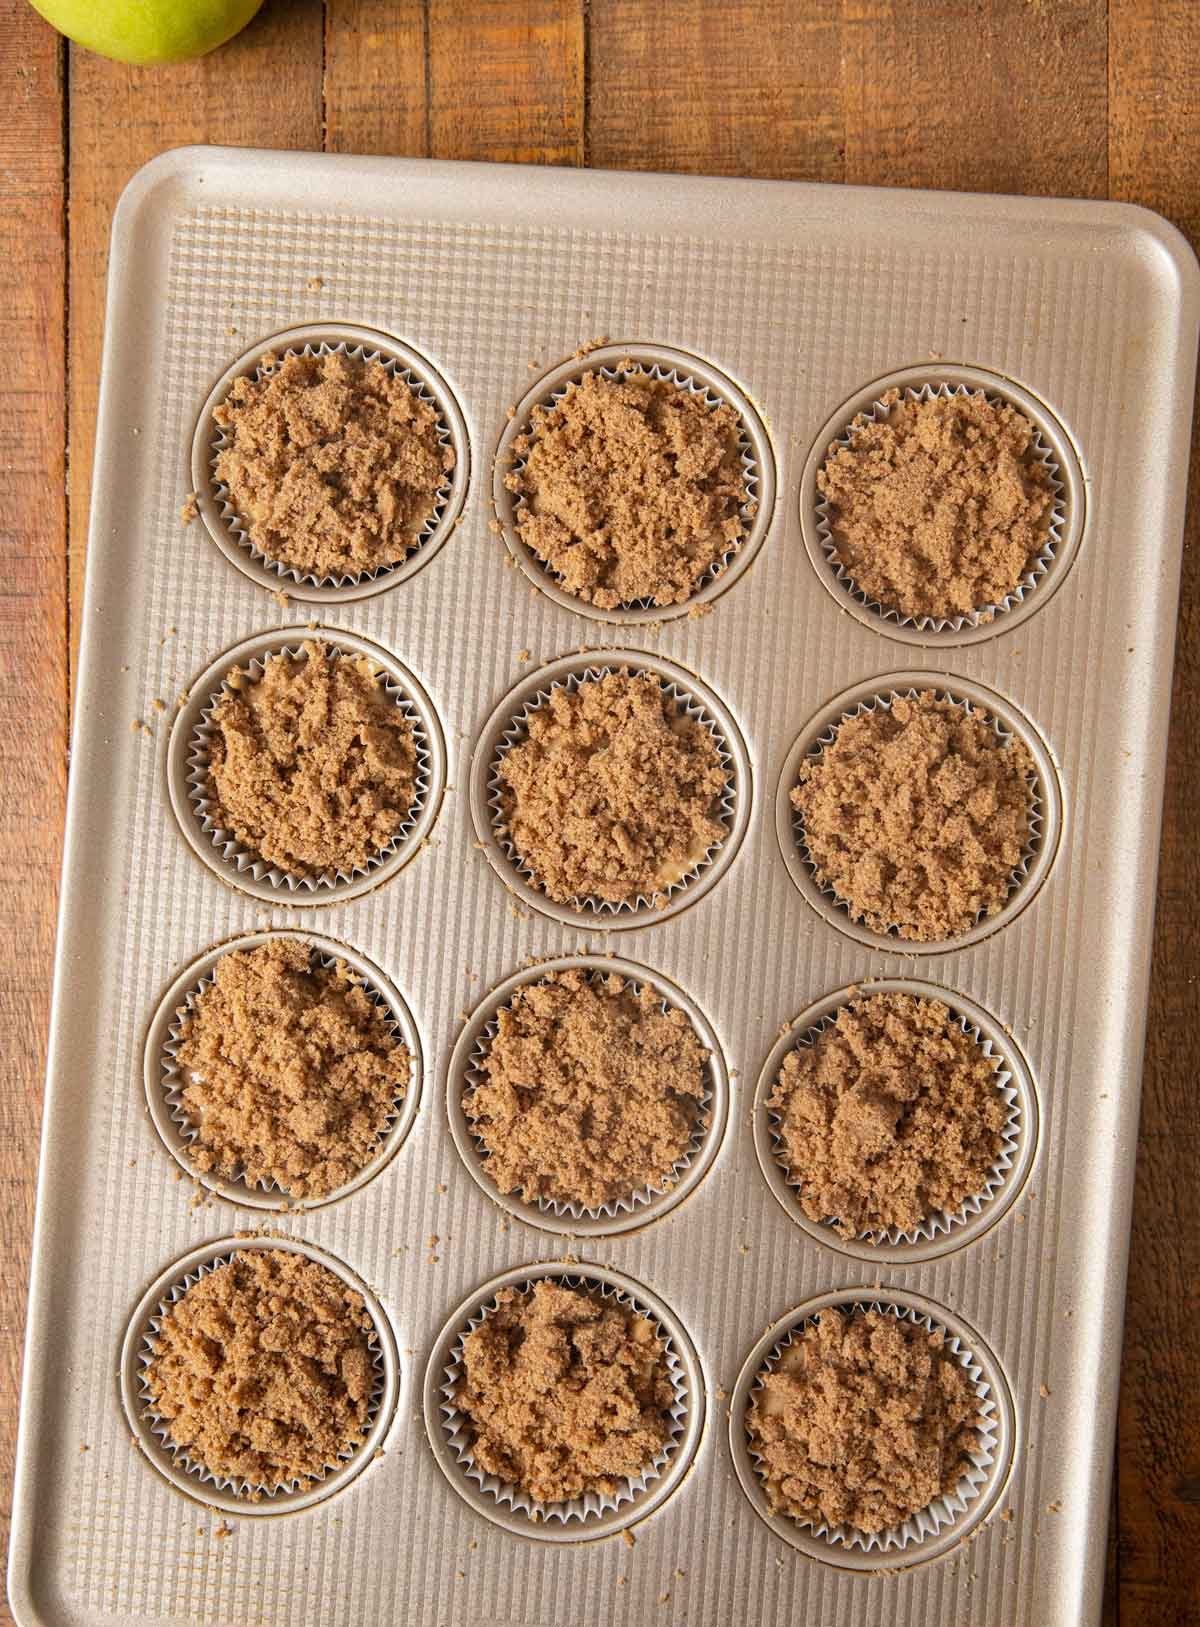 Apple Pie Muffins batter in cupcake tin before baking